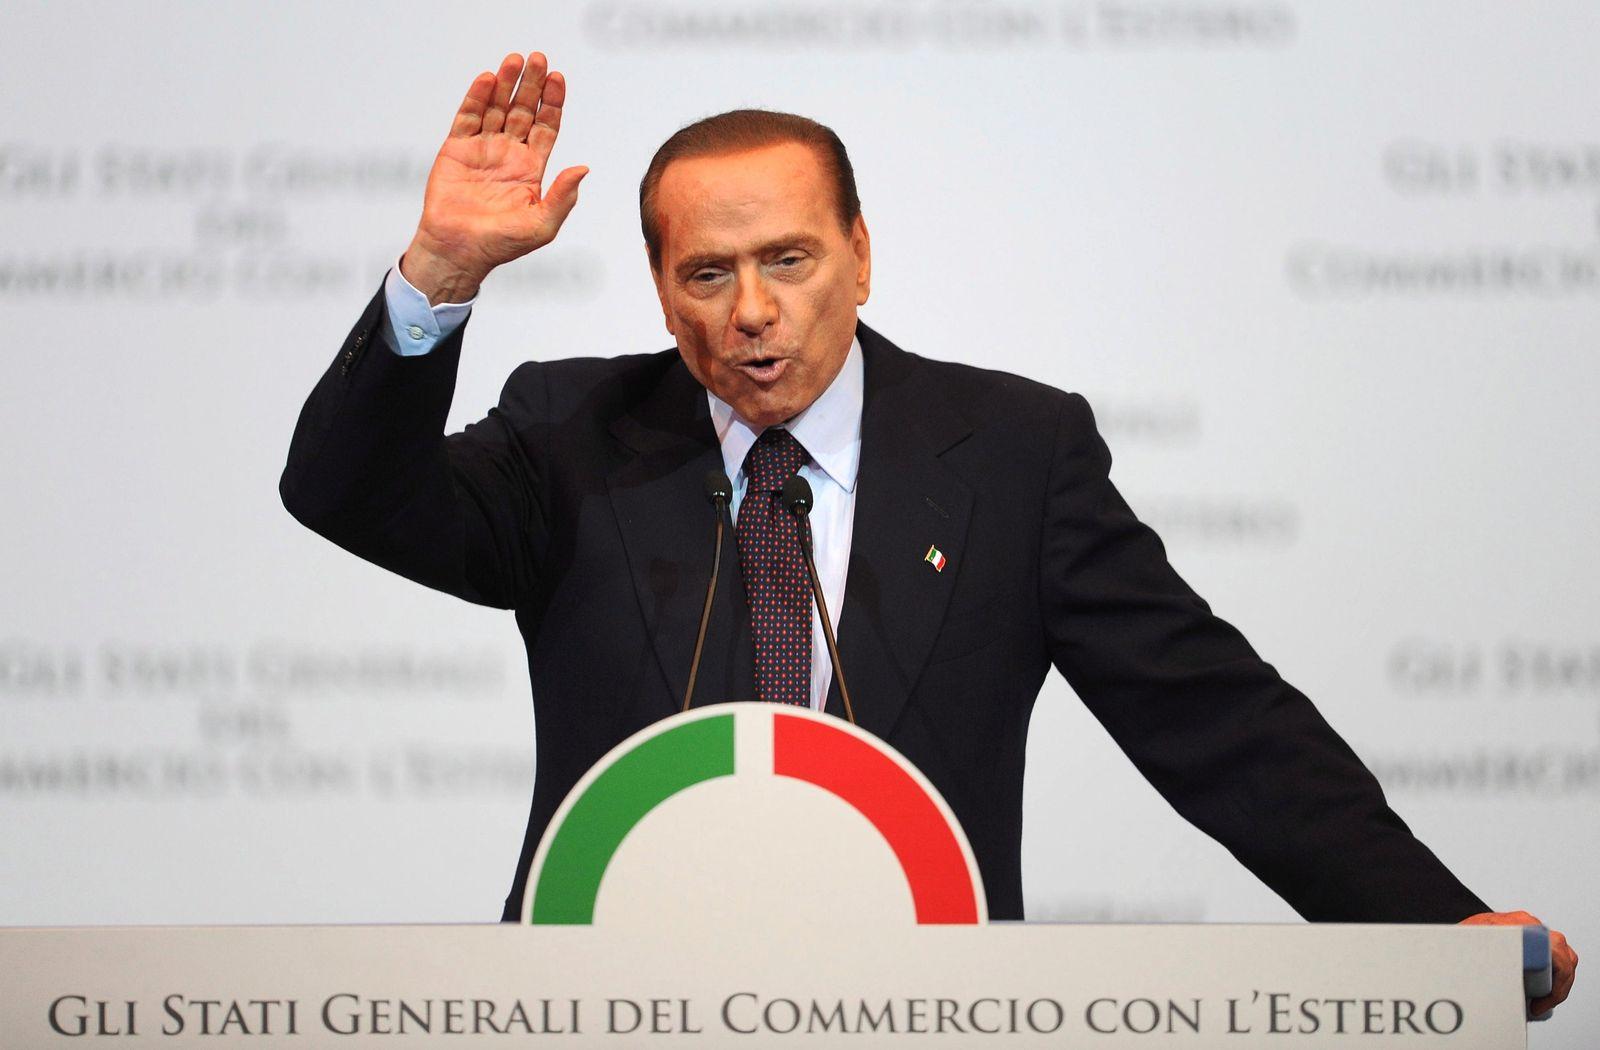 Silvio Berlusconi XXL